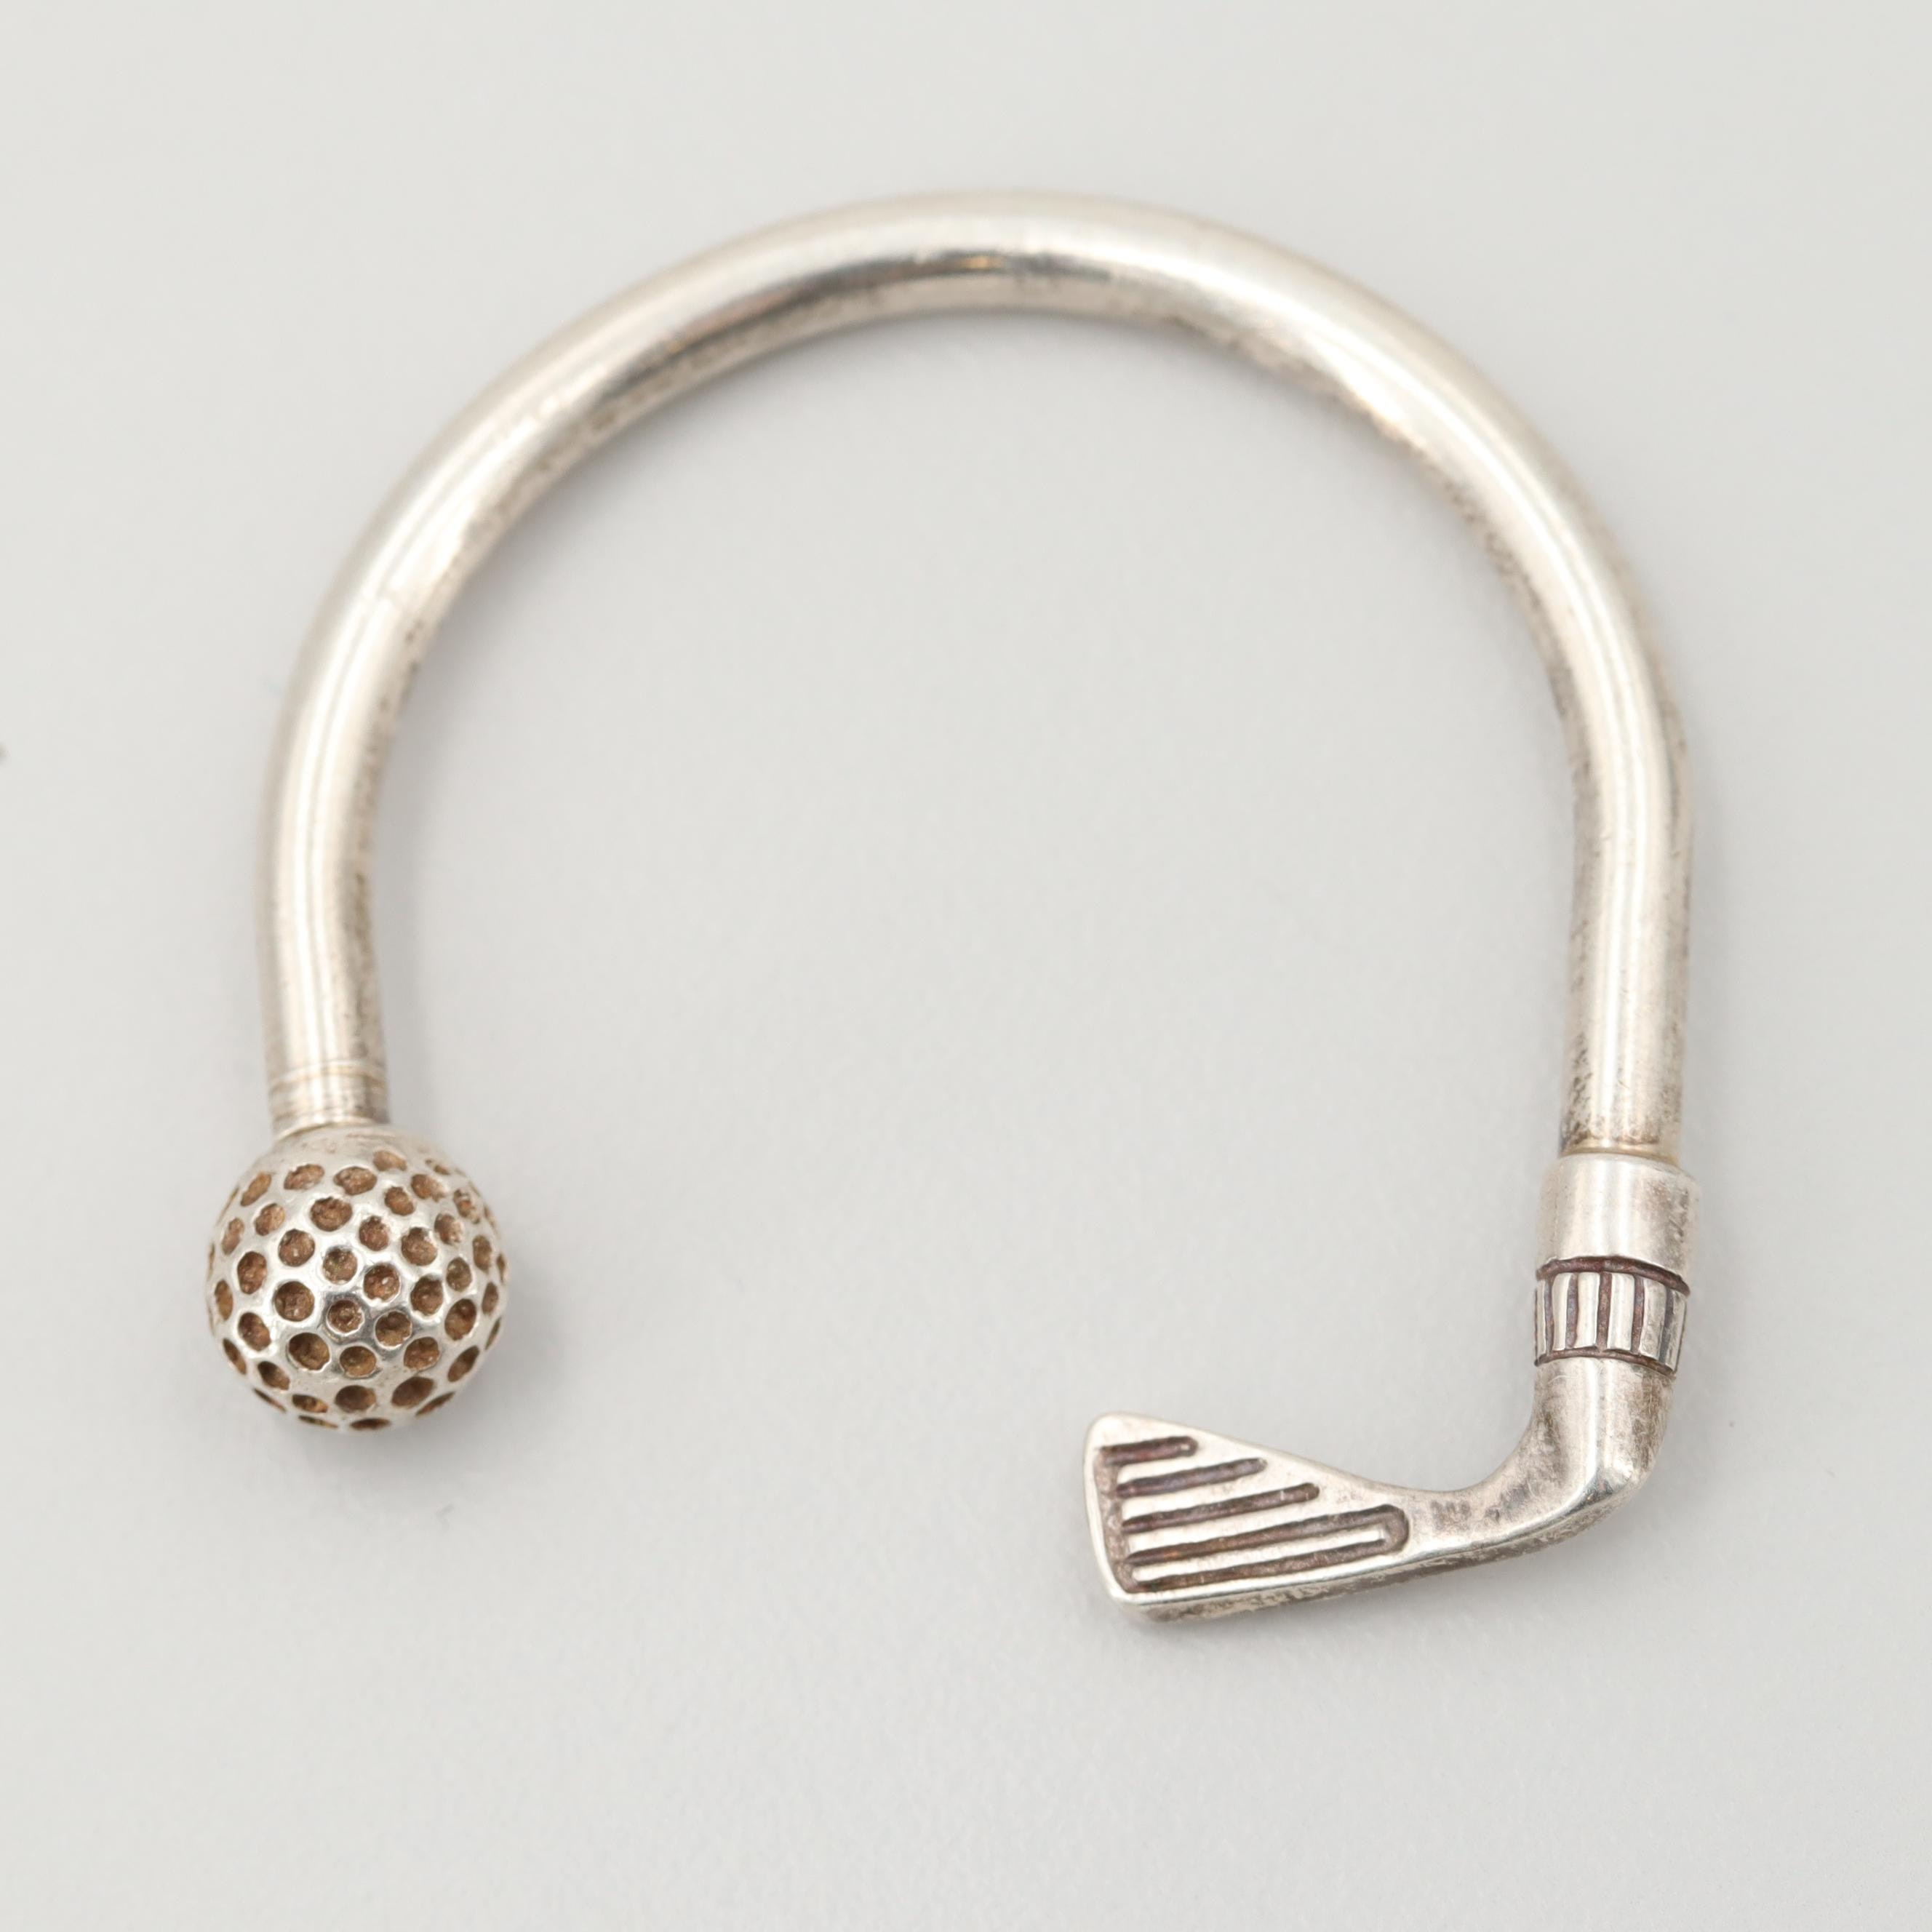 Sterling Silver Golf Club Key Ring